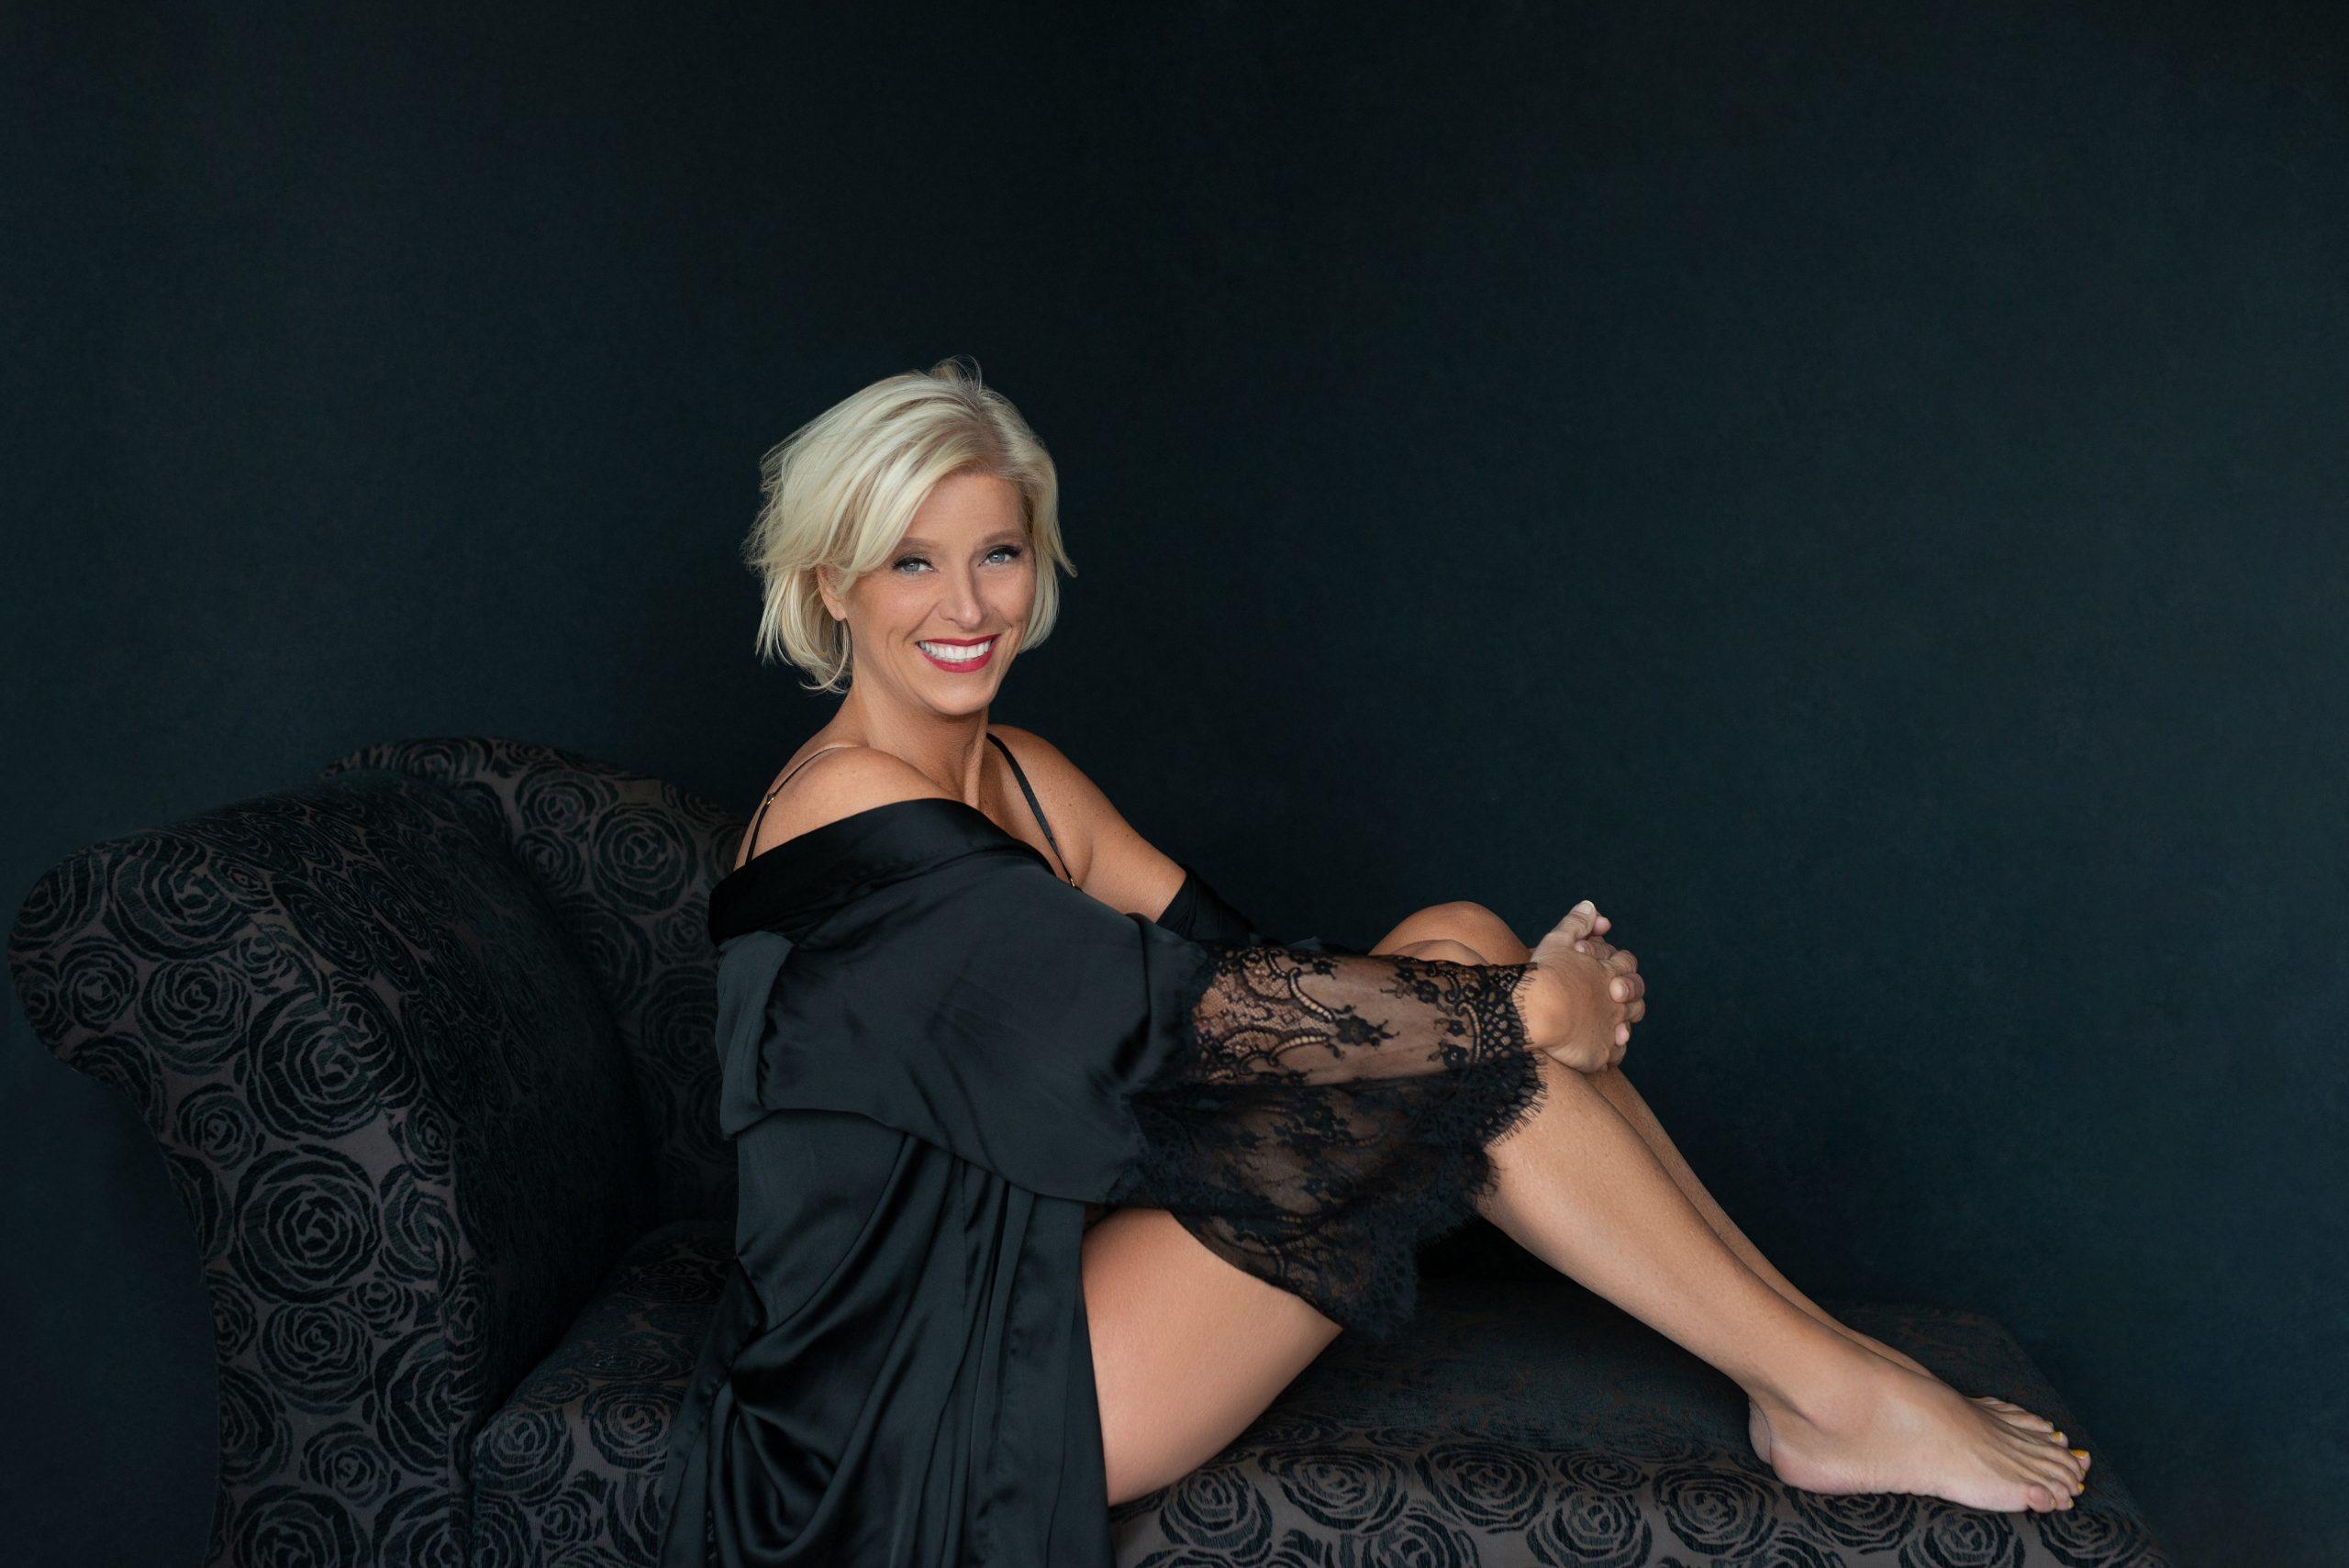 vrouw in zwarte peignoir